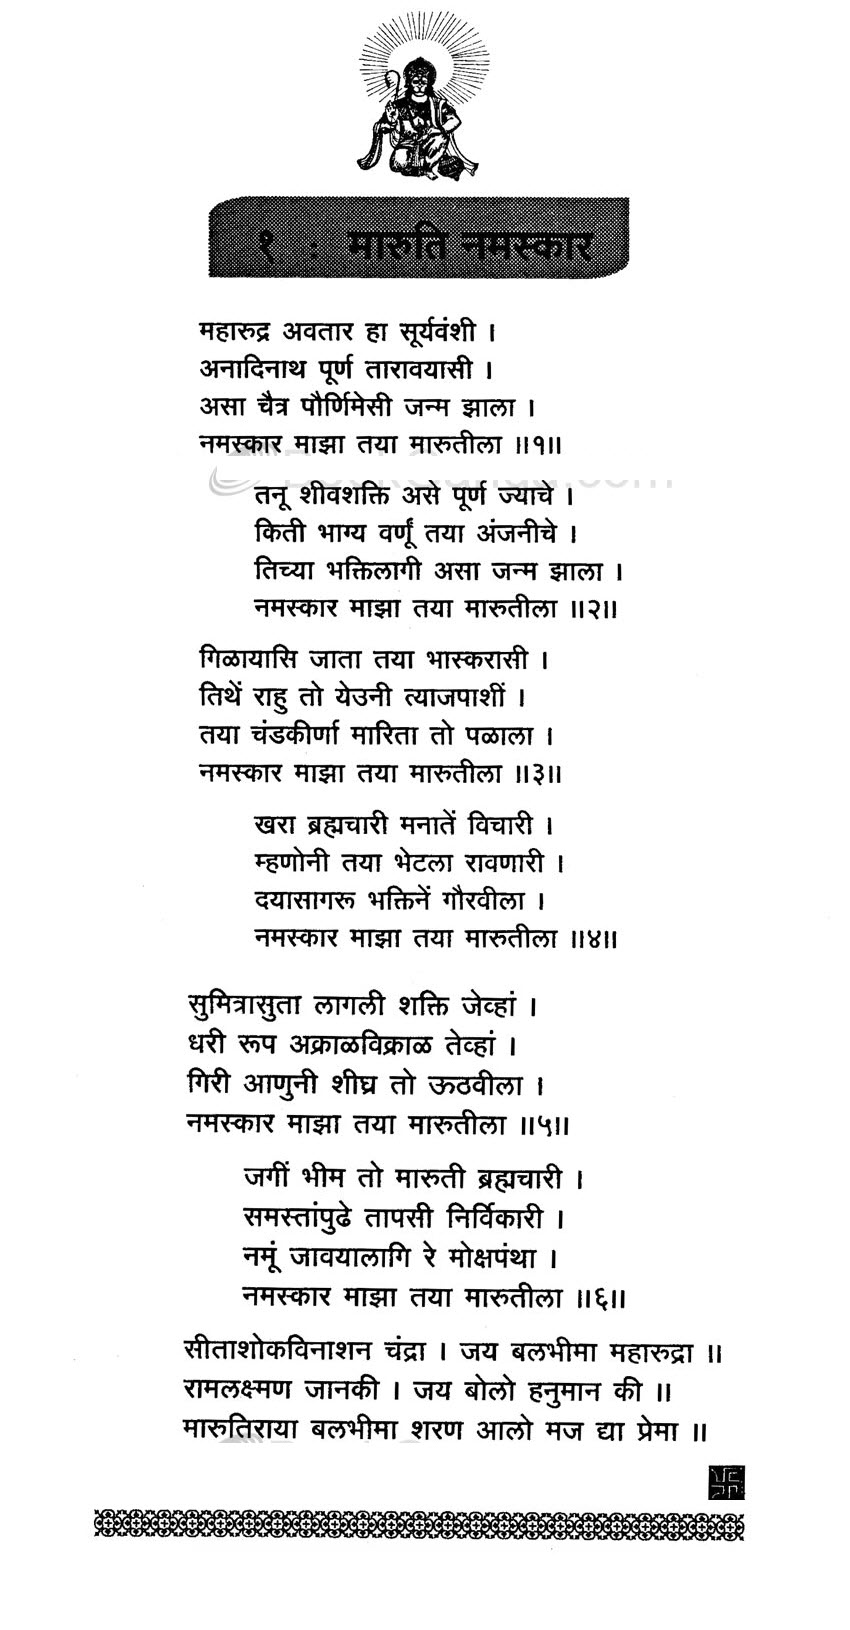 Hanuman maruti namaskar marathi stotra complete hindu gods and